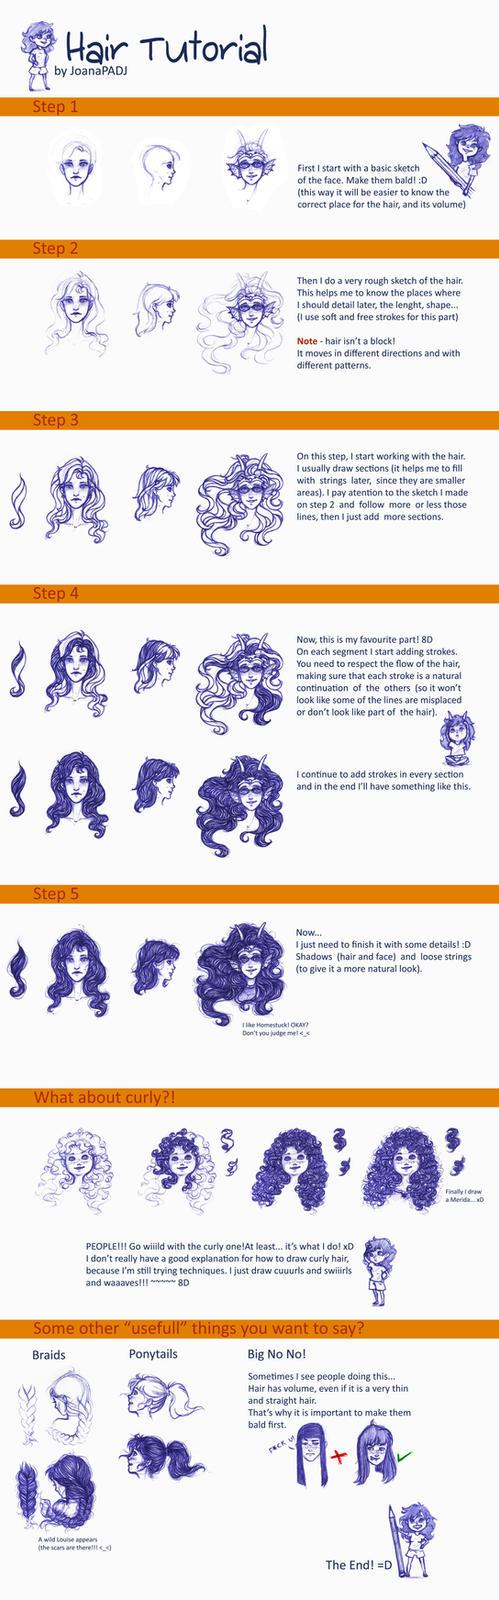 Hair Tutorial by TheJoanaPADJ